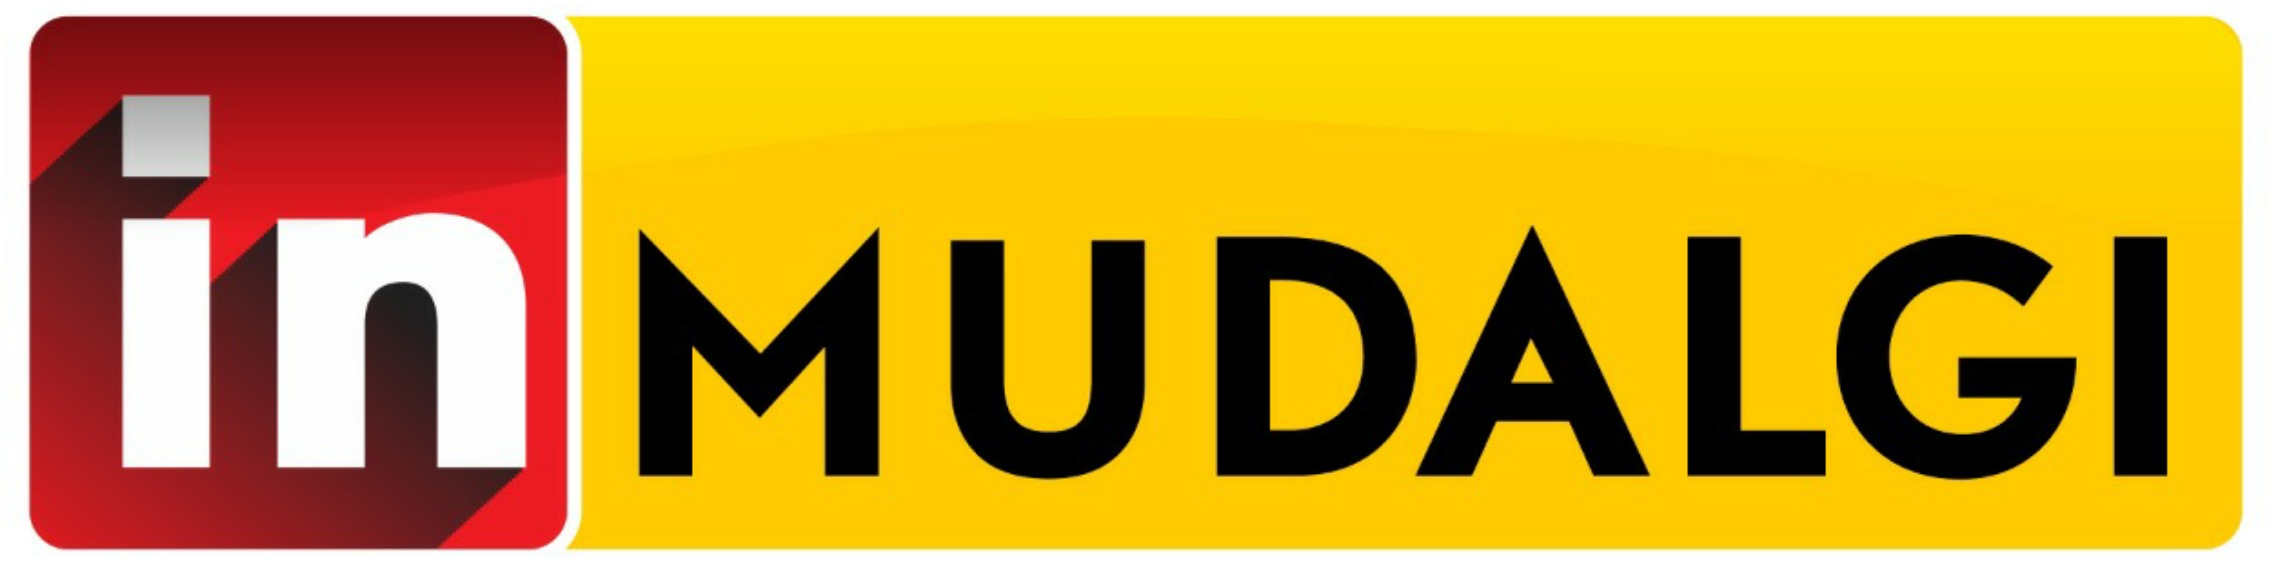 IN MUDALGI